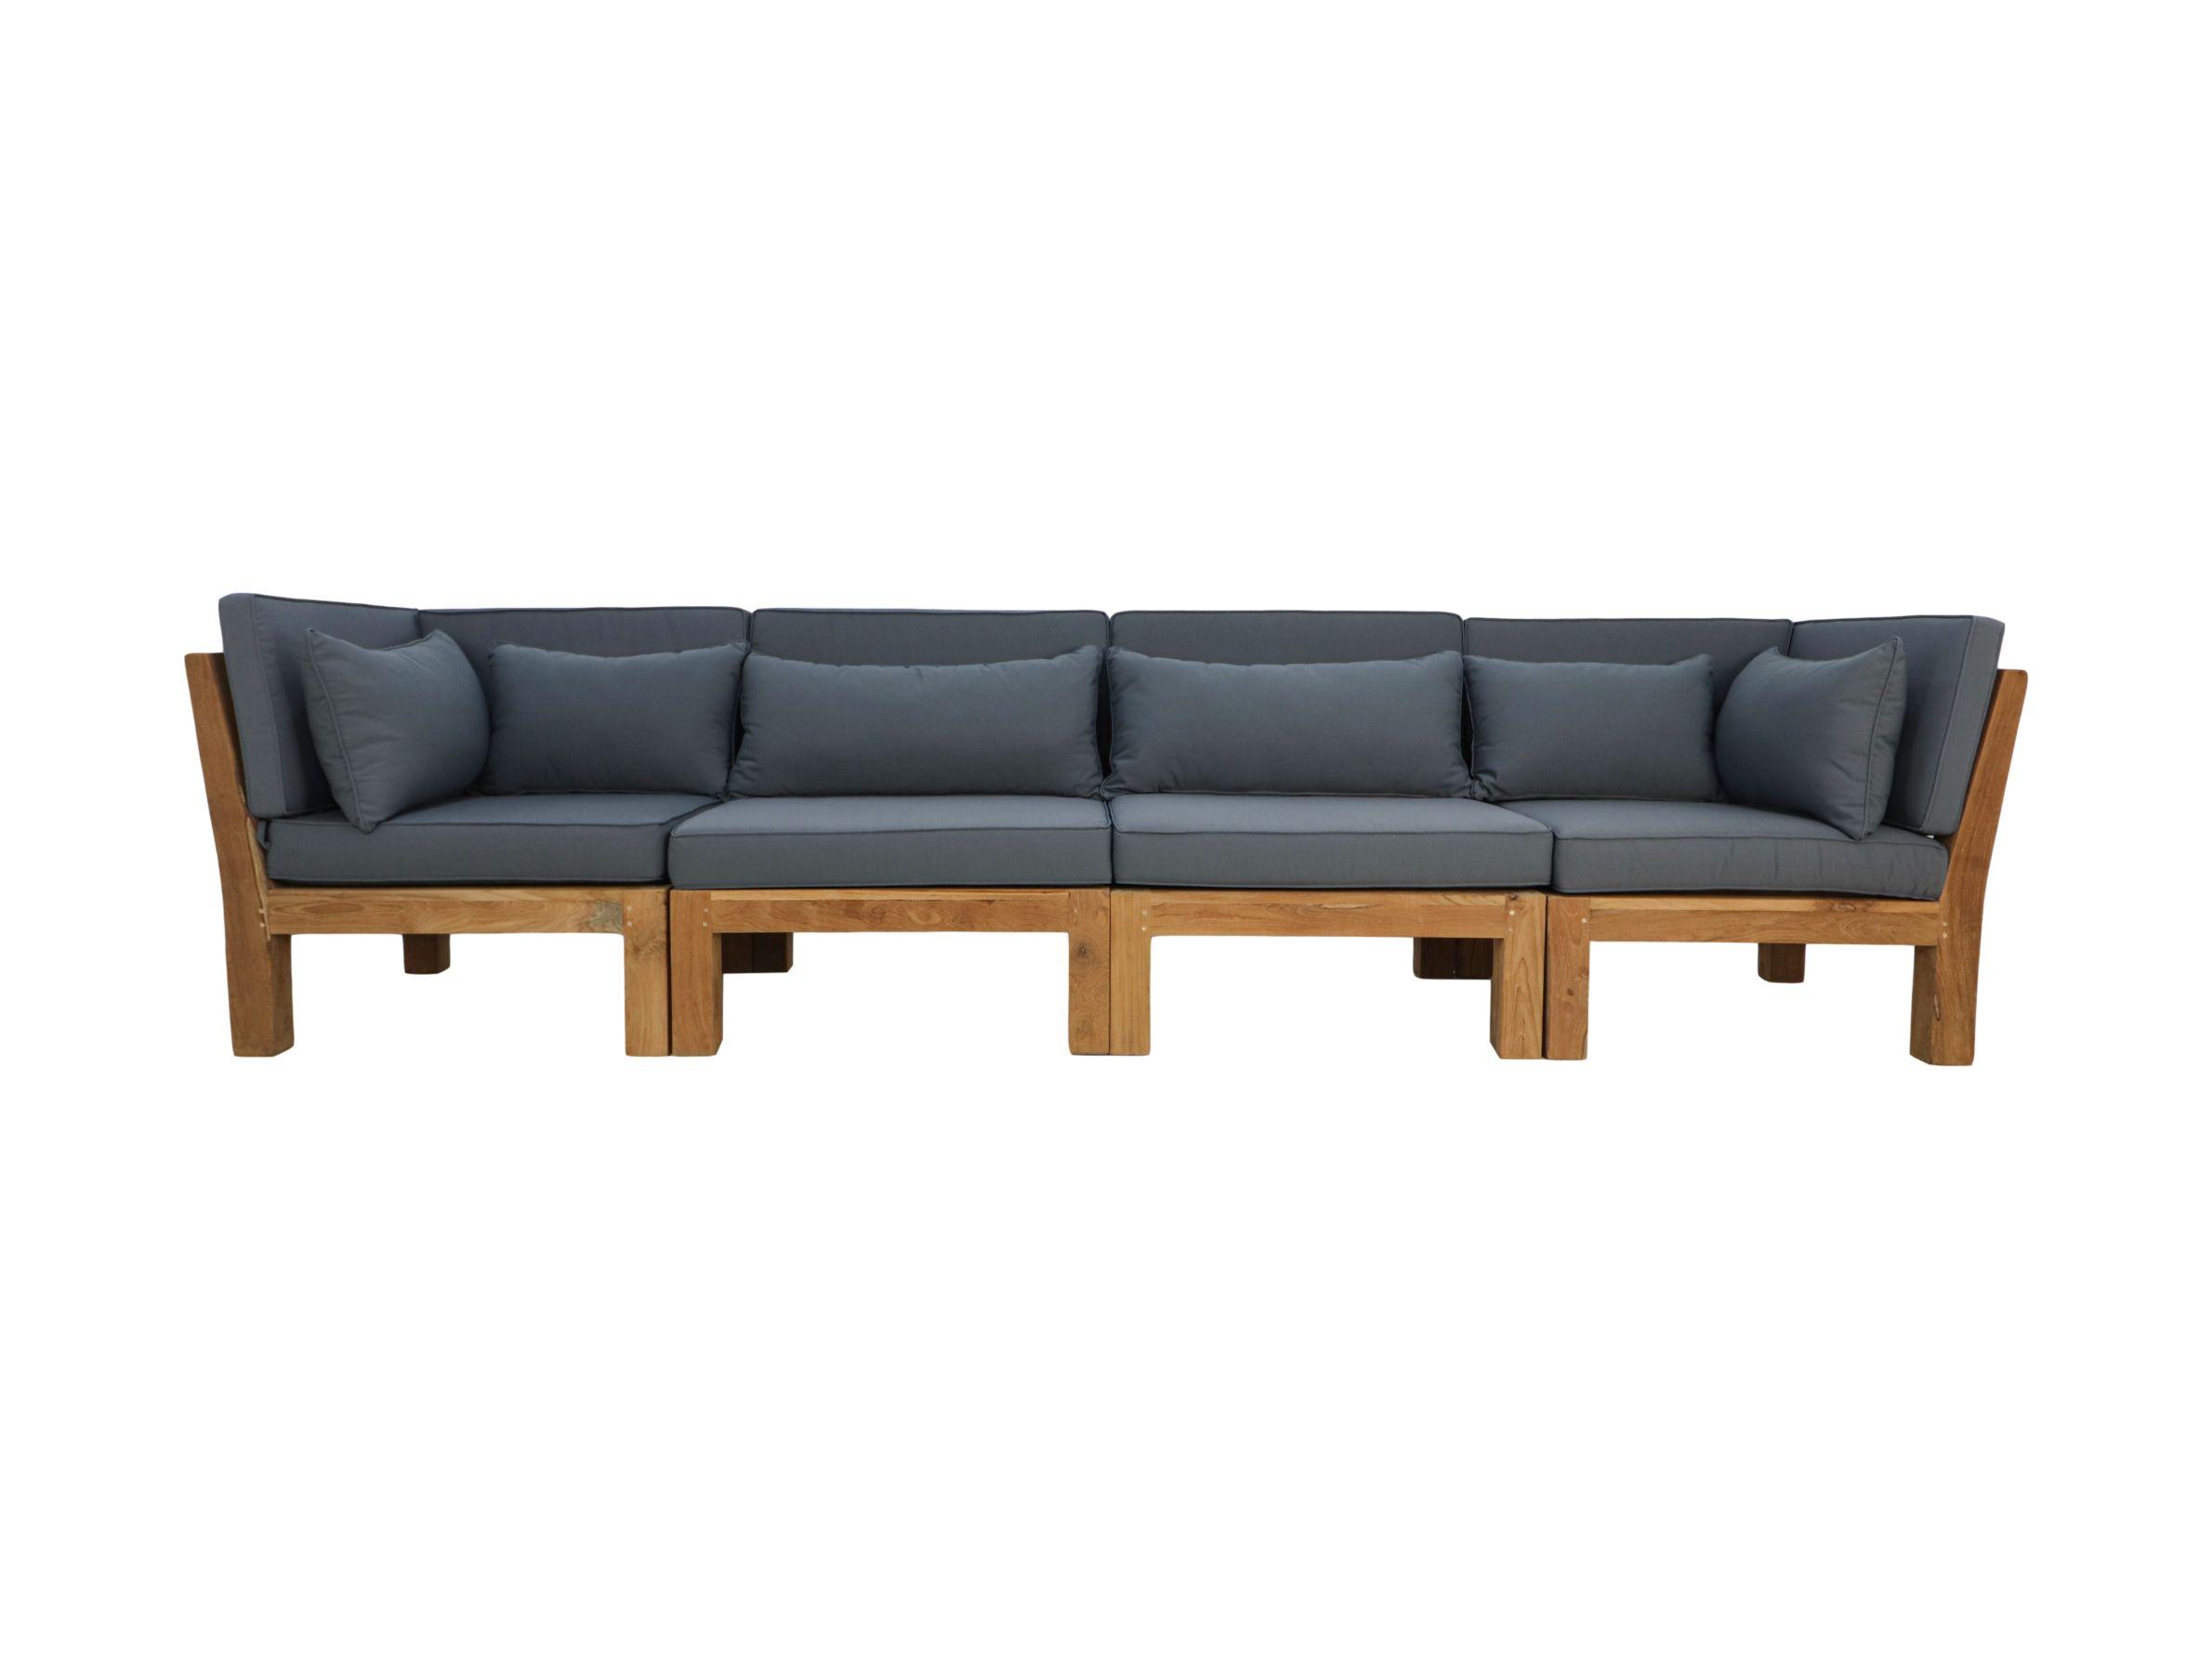 Tuin 4-zits loungeset modulair Aruba (incl. kussens) - 4-delig - Hout - Bruin